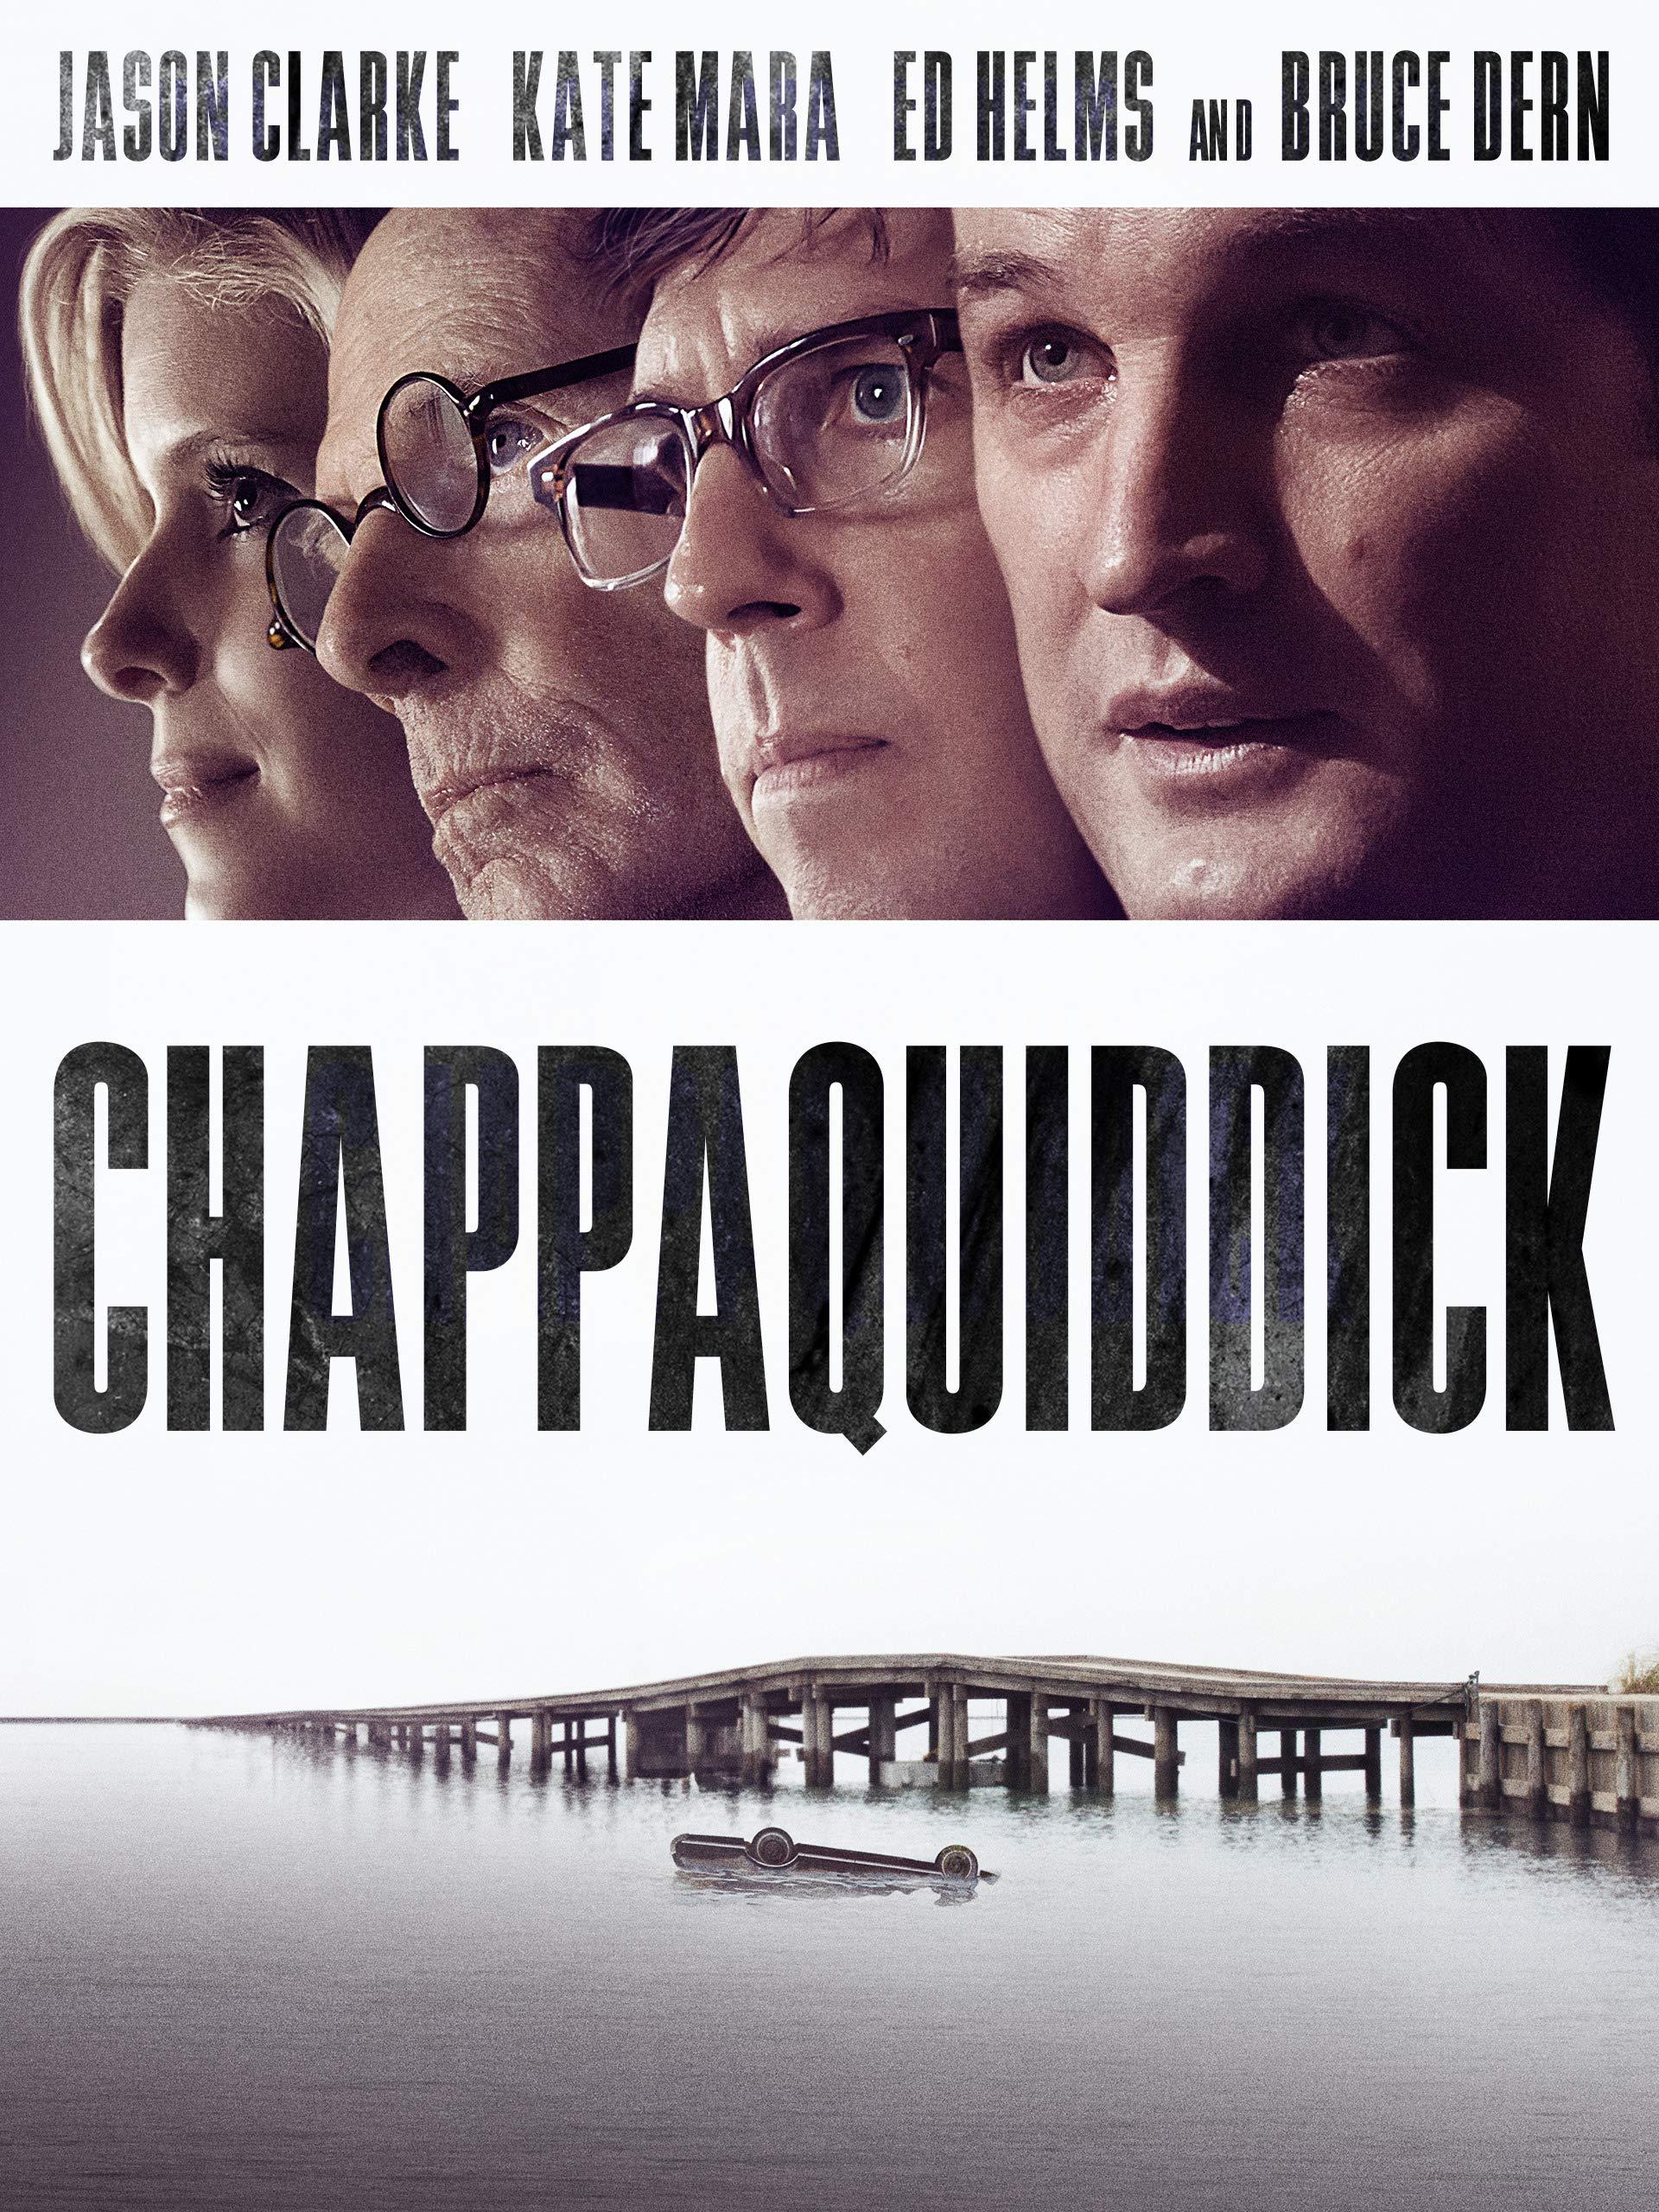 Watch Chappaquiddick Prime Video